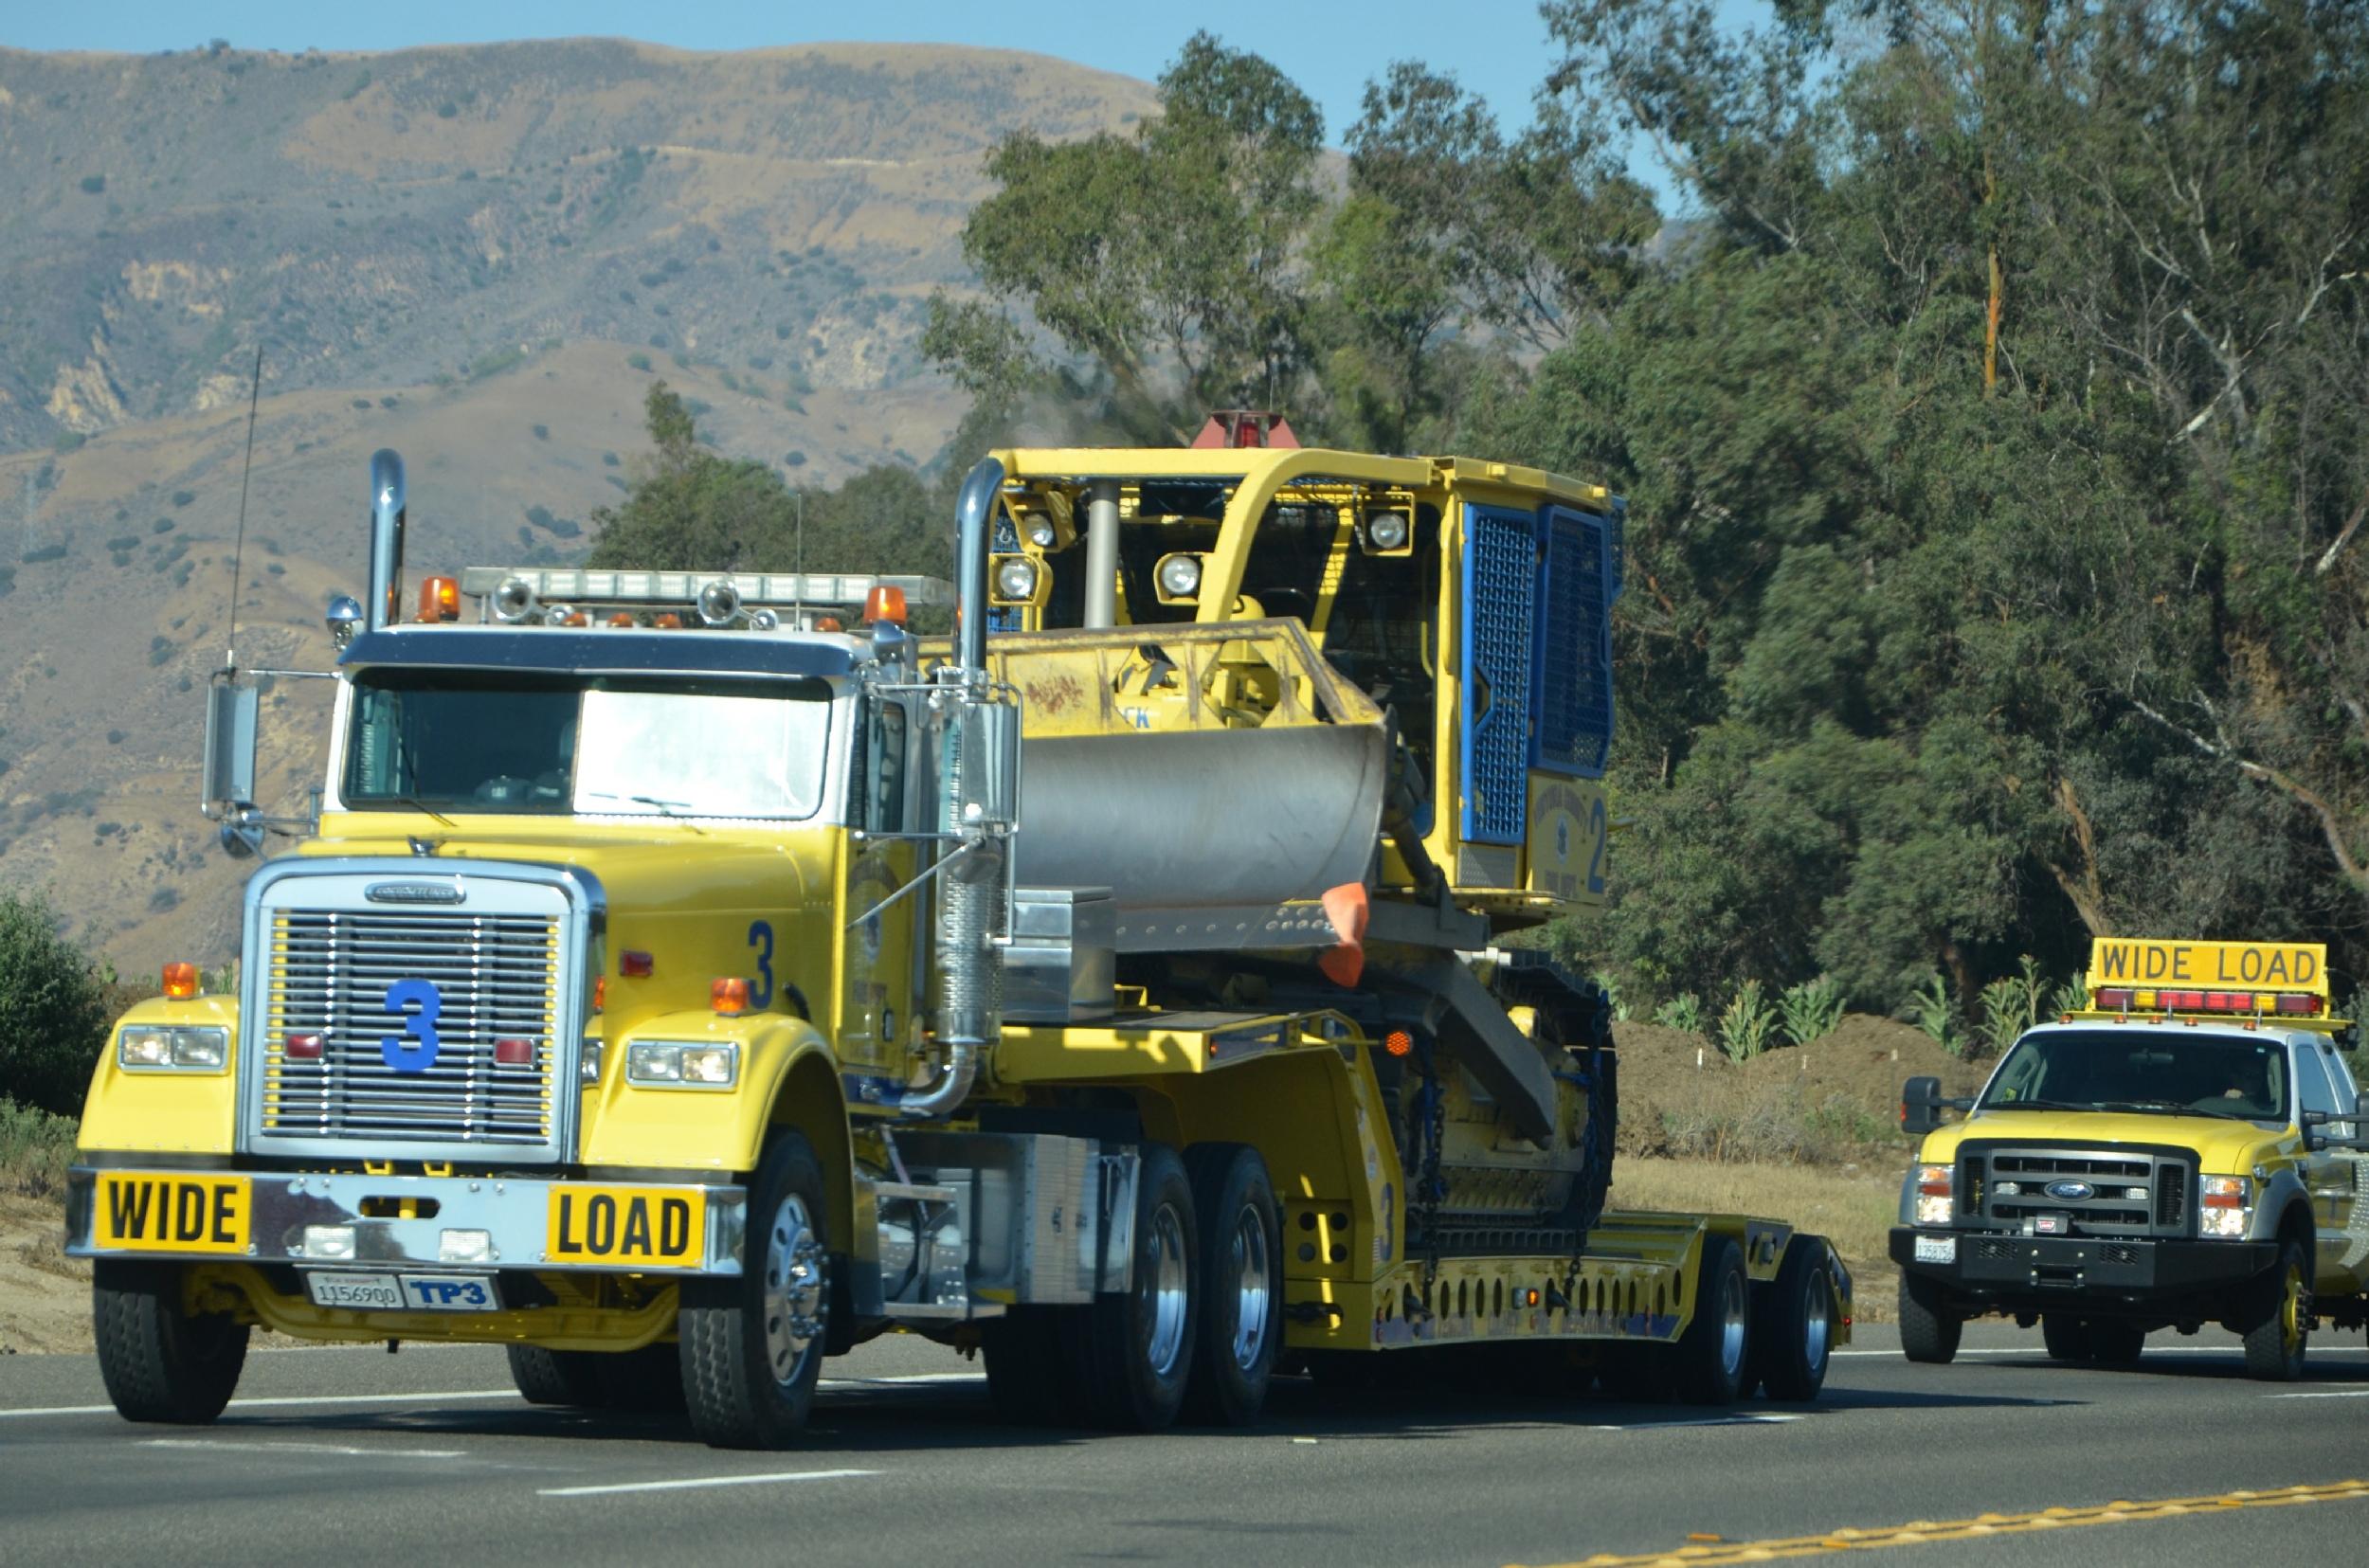 dozer county ventura fire transport department sterling